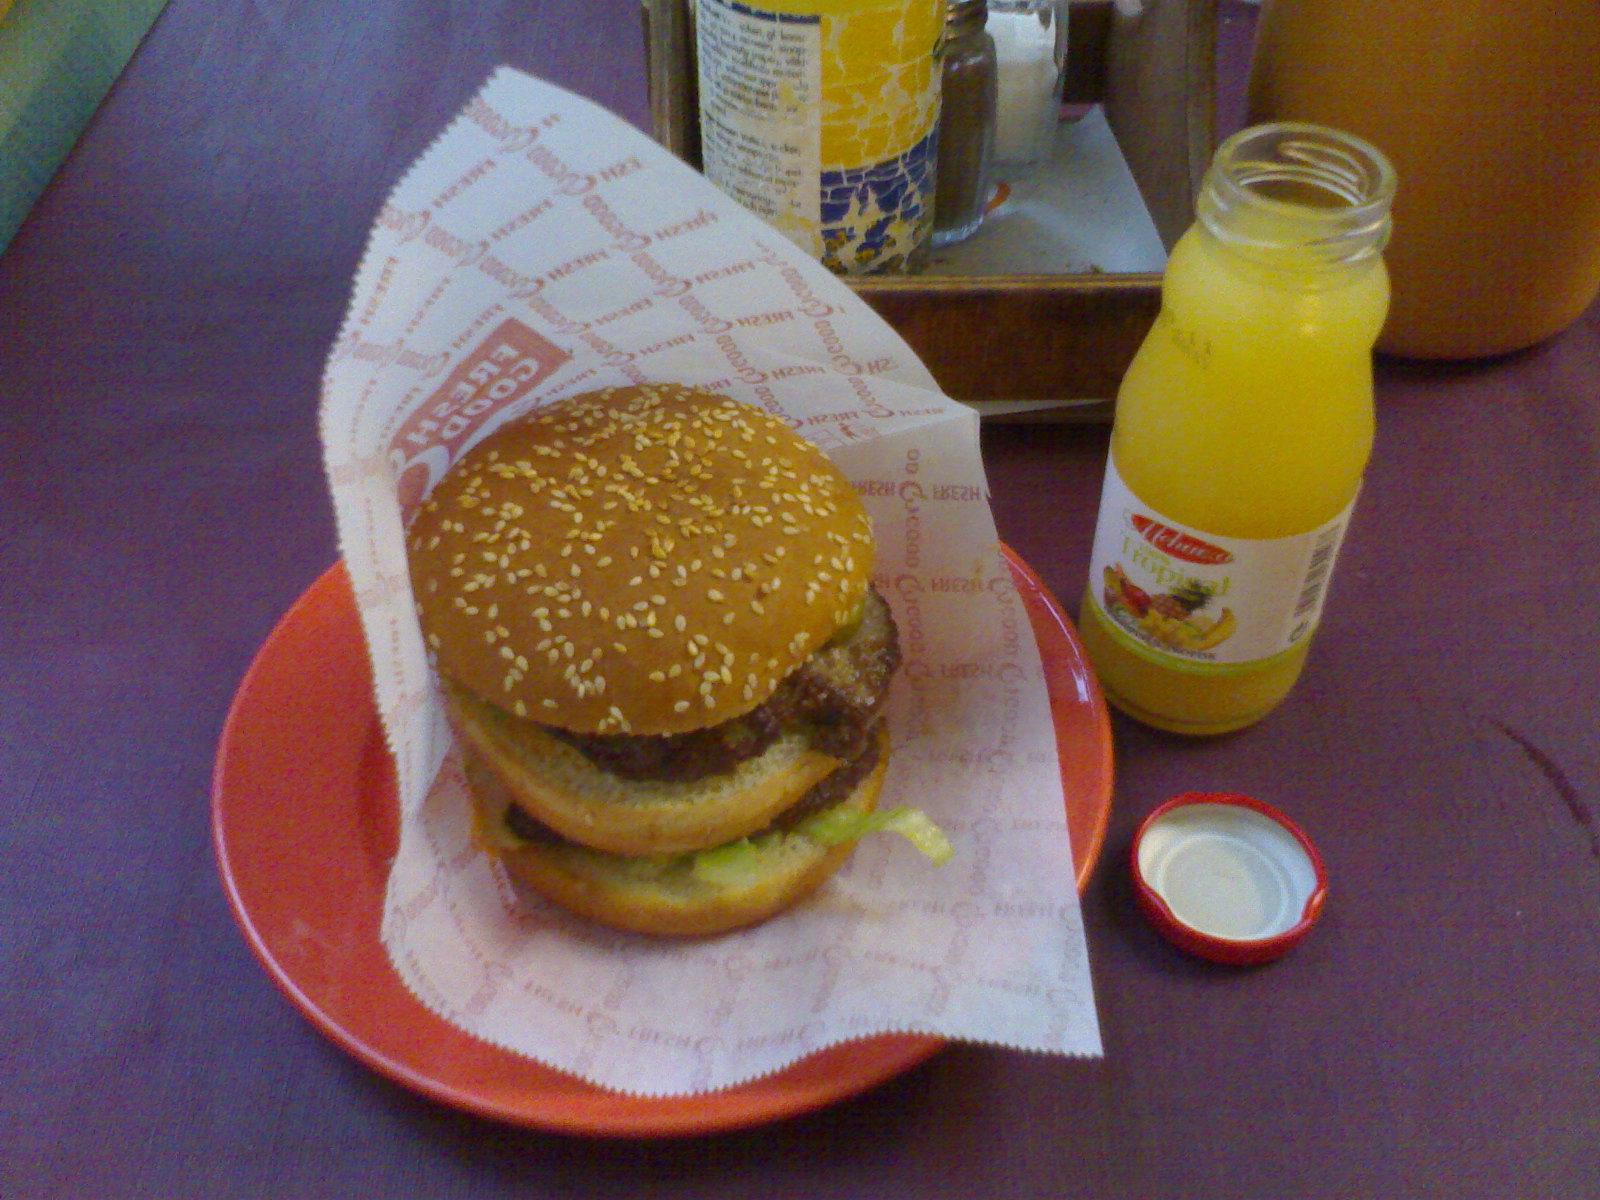 Cafe Puistopicnic, Porvoo: kerrosburgeri ja mehu